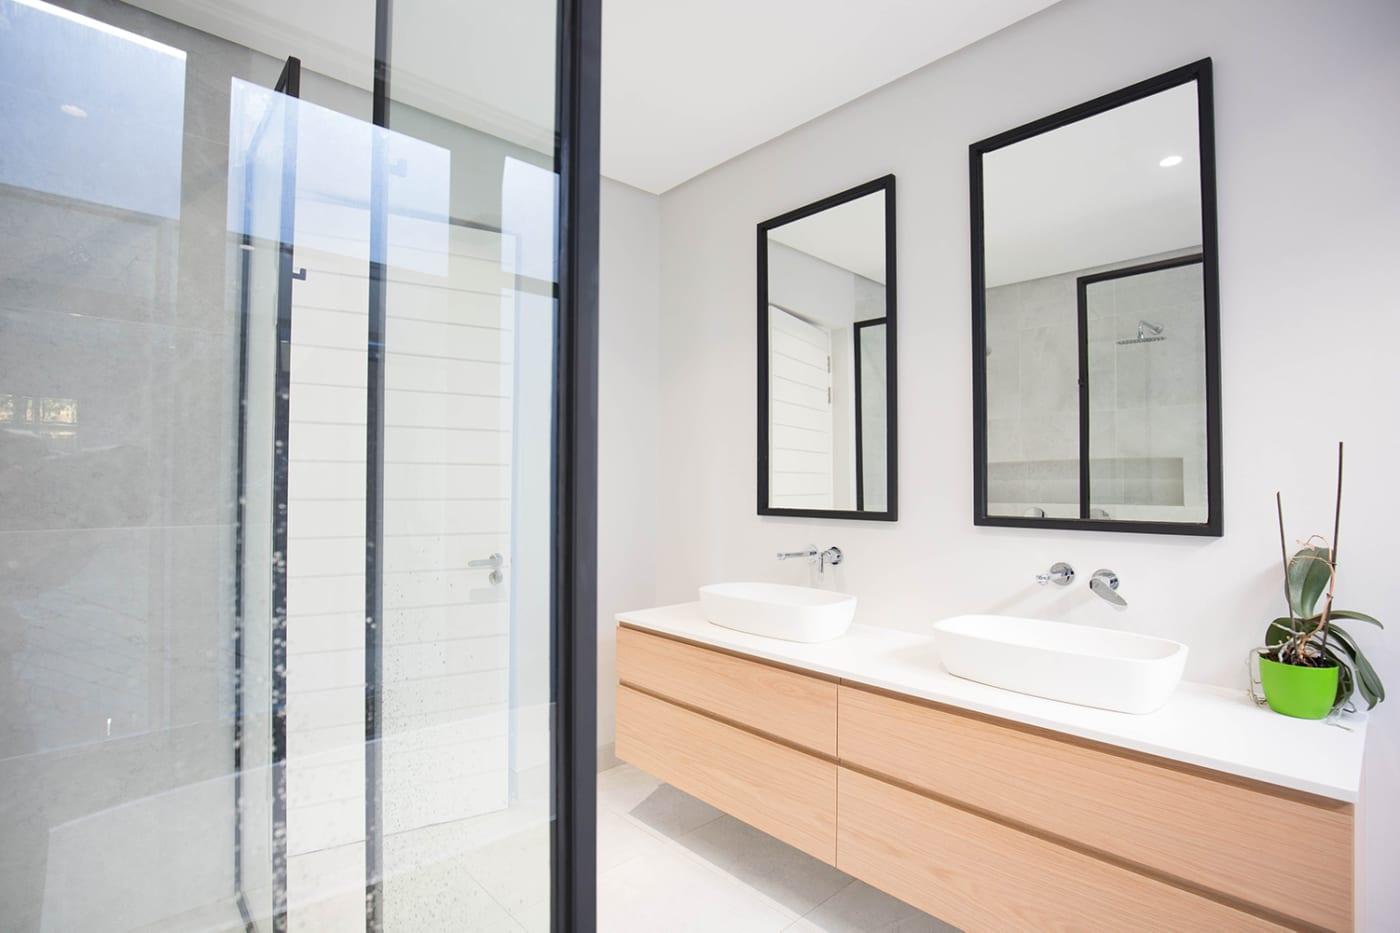 House Nel - Metal Windows - Master bedroom